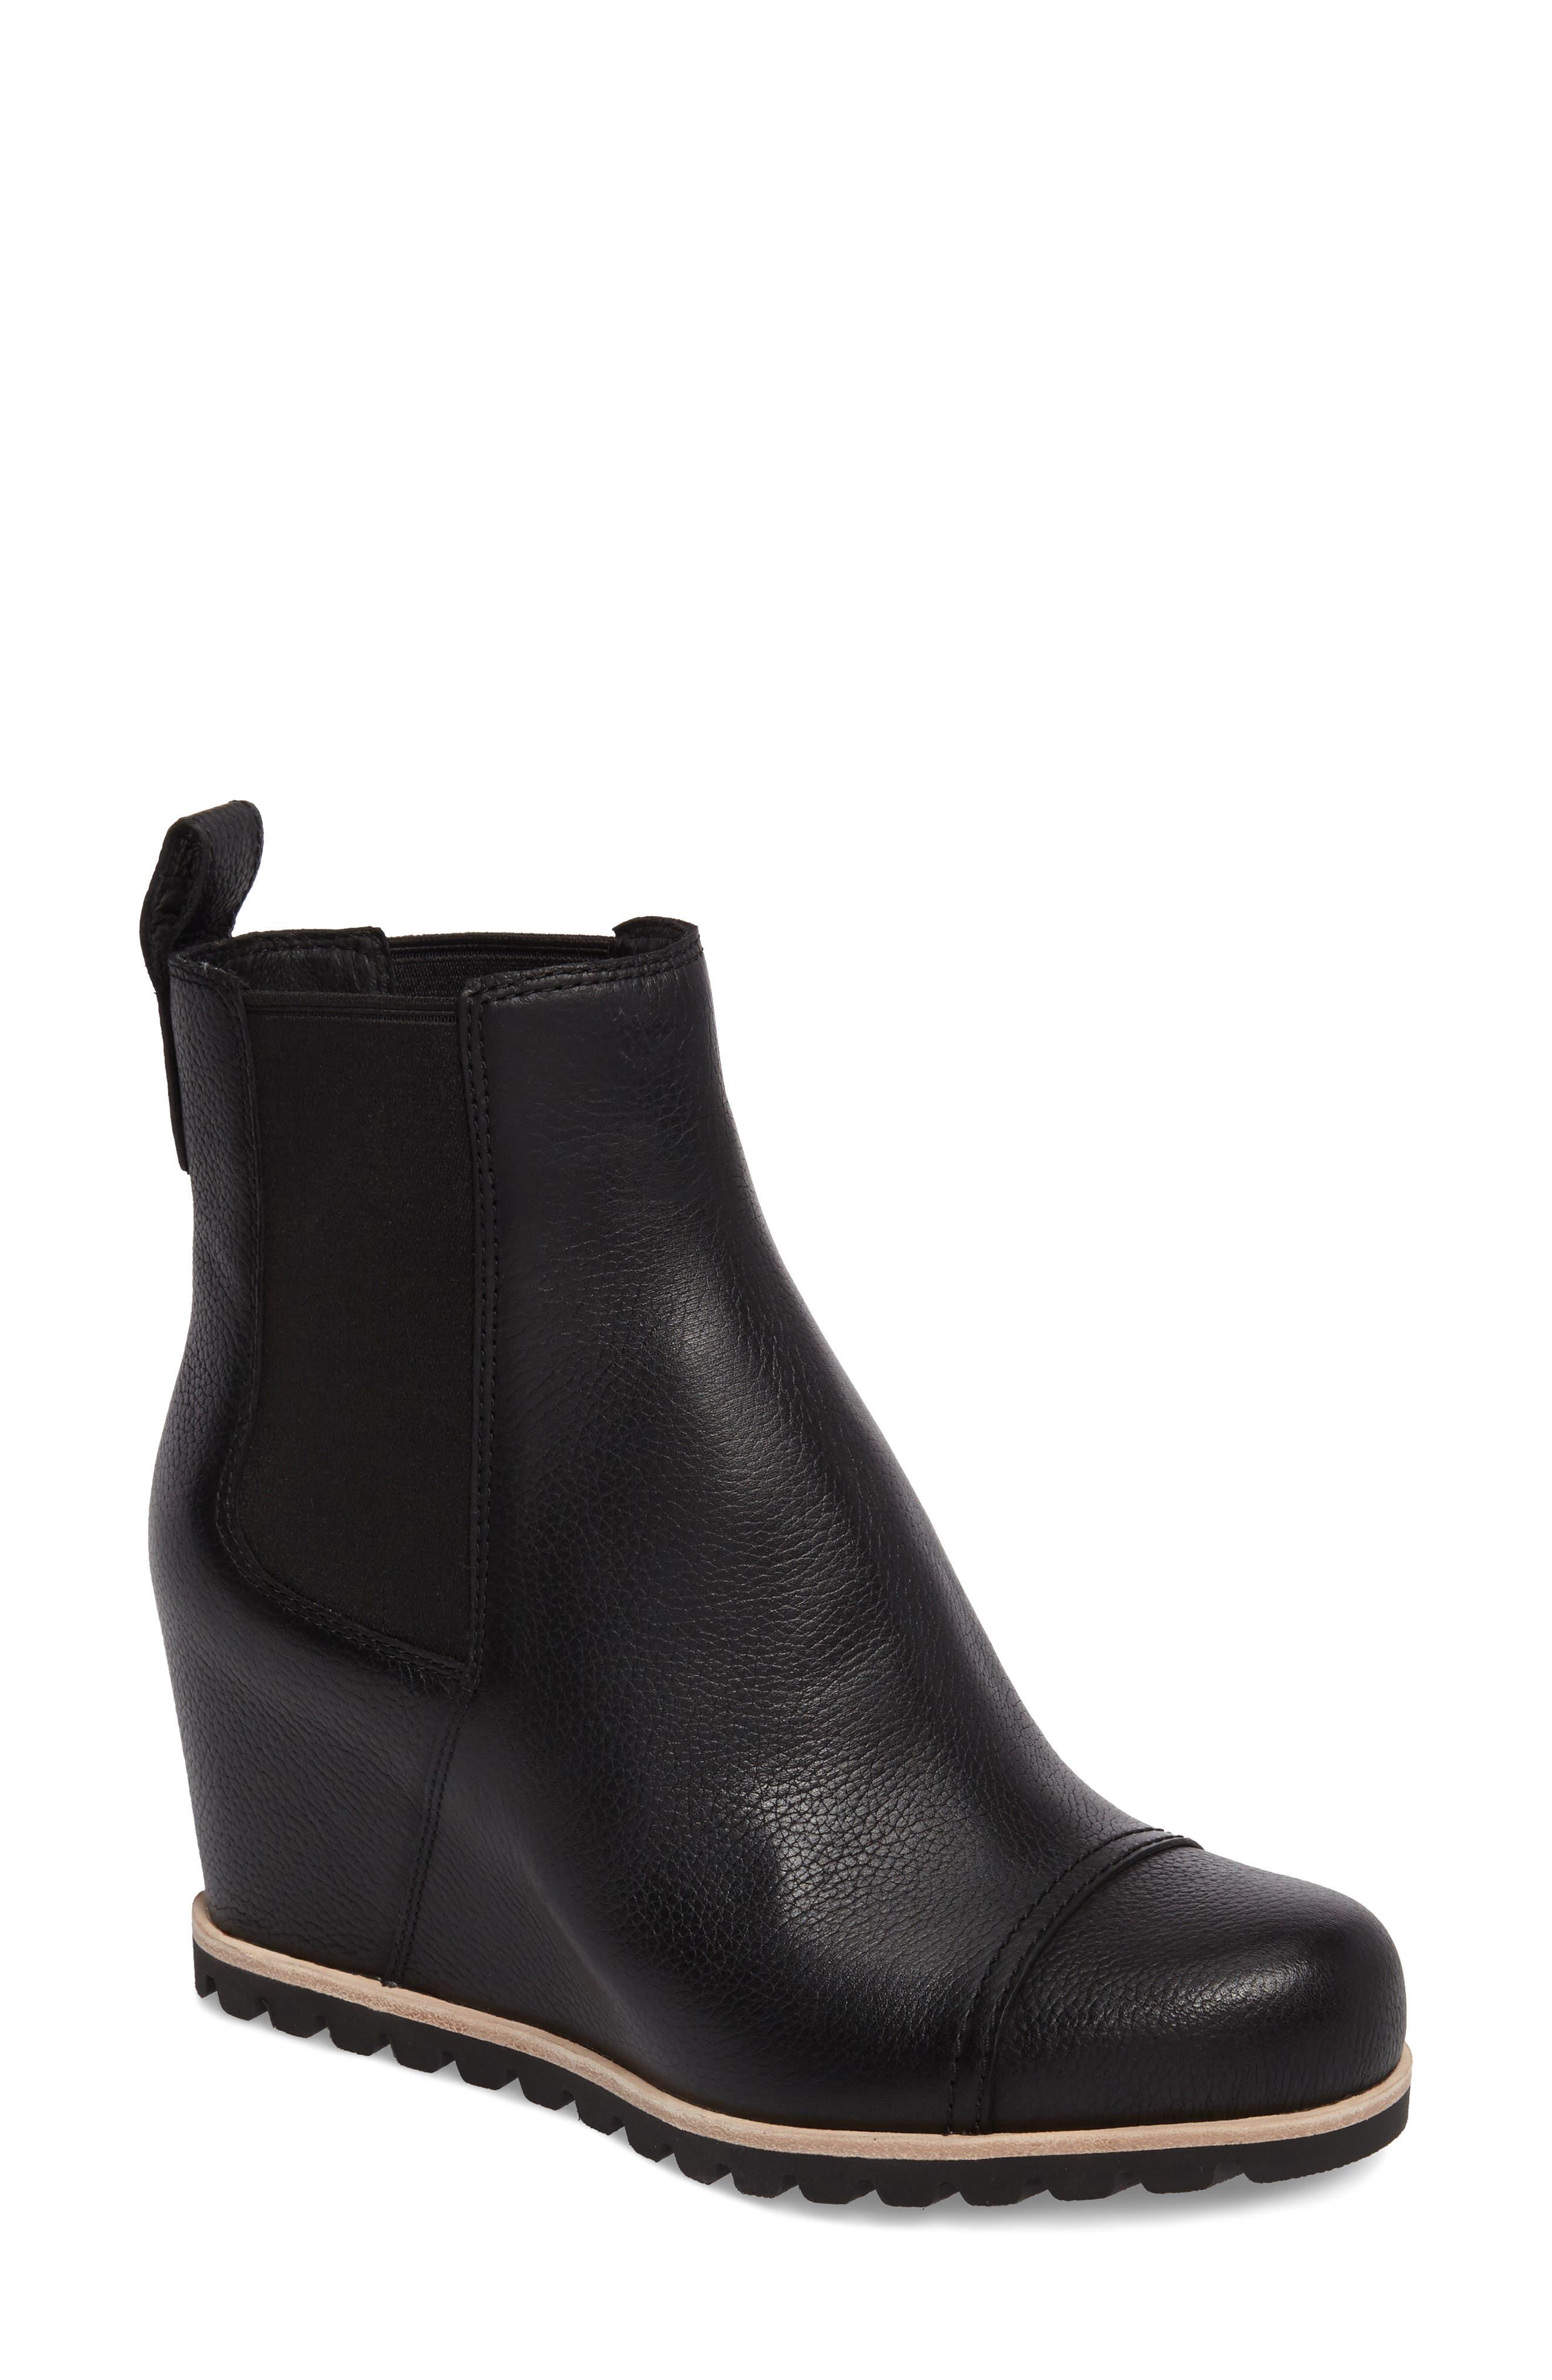 UGG | Pax Waterproof Wedge Leather Boot